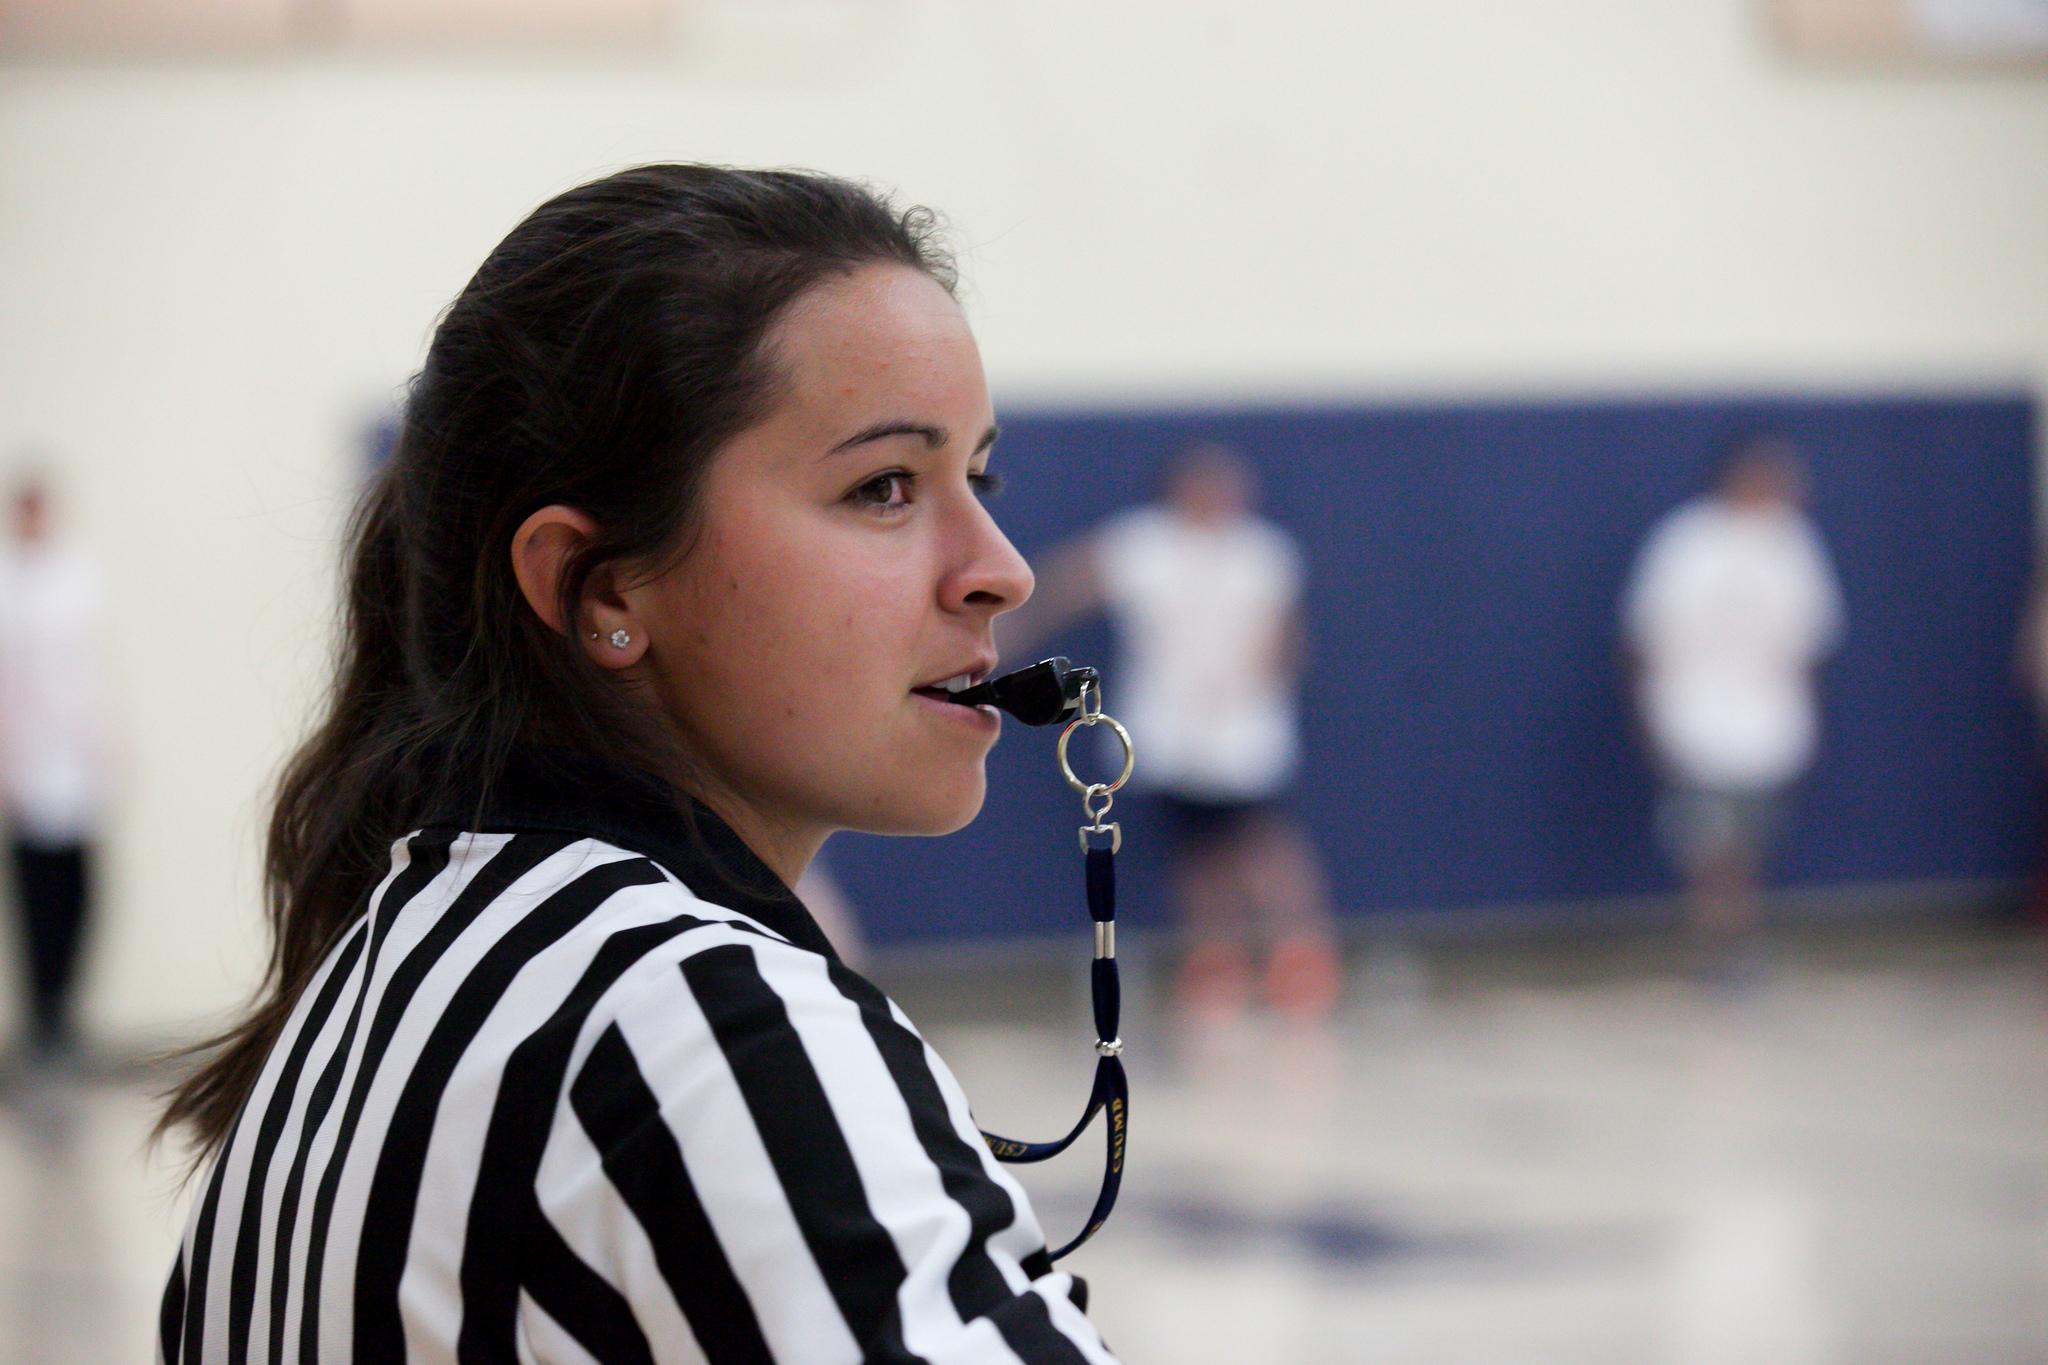 Student referee